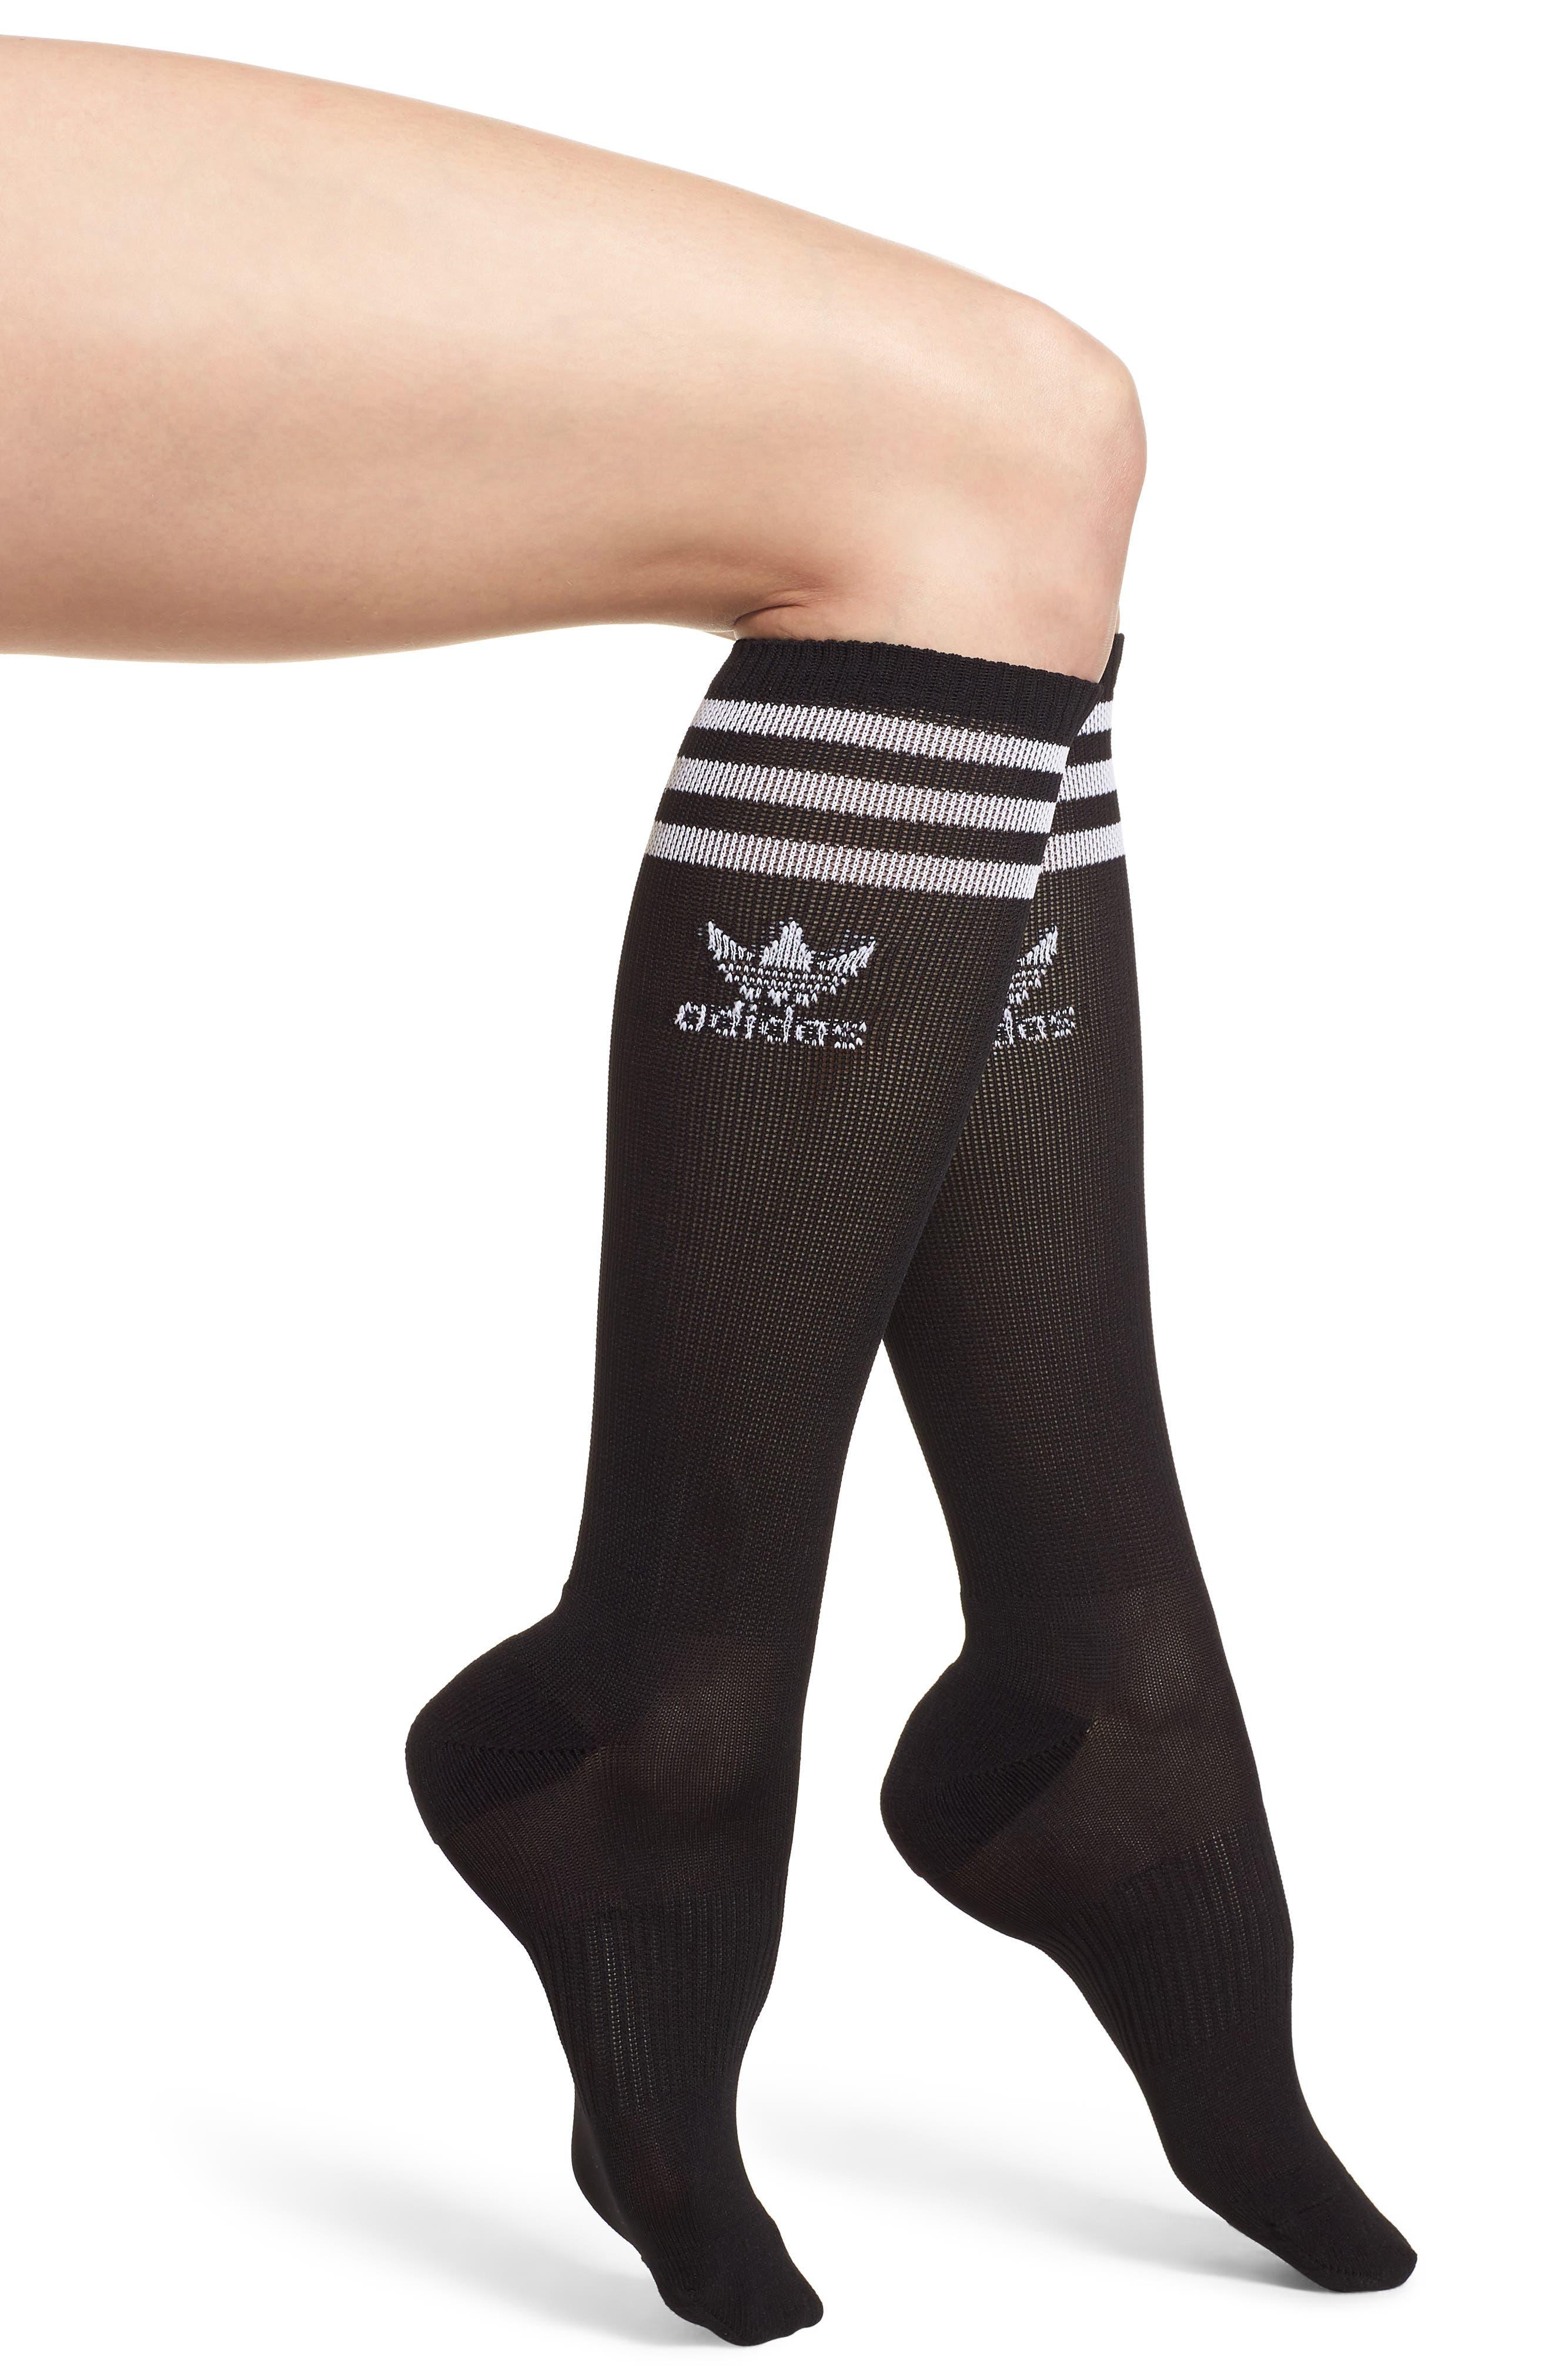 Roller Knee High Socks,                         Main,                         color, Black